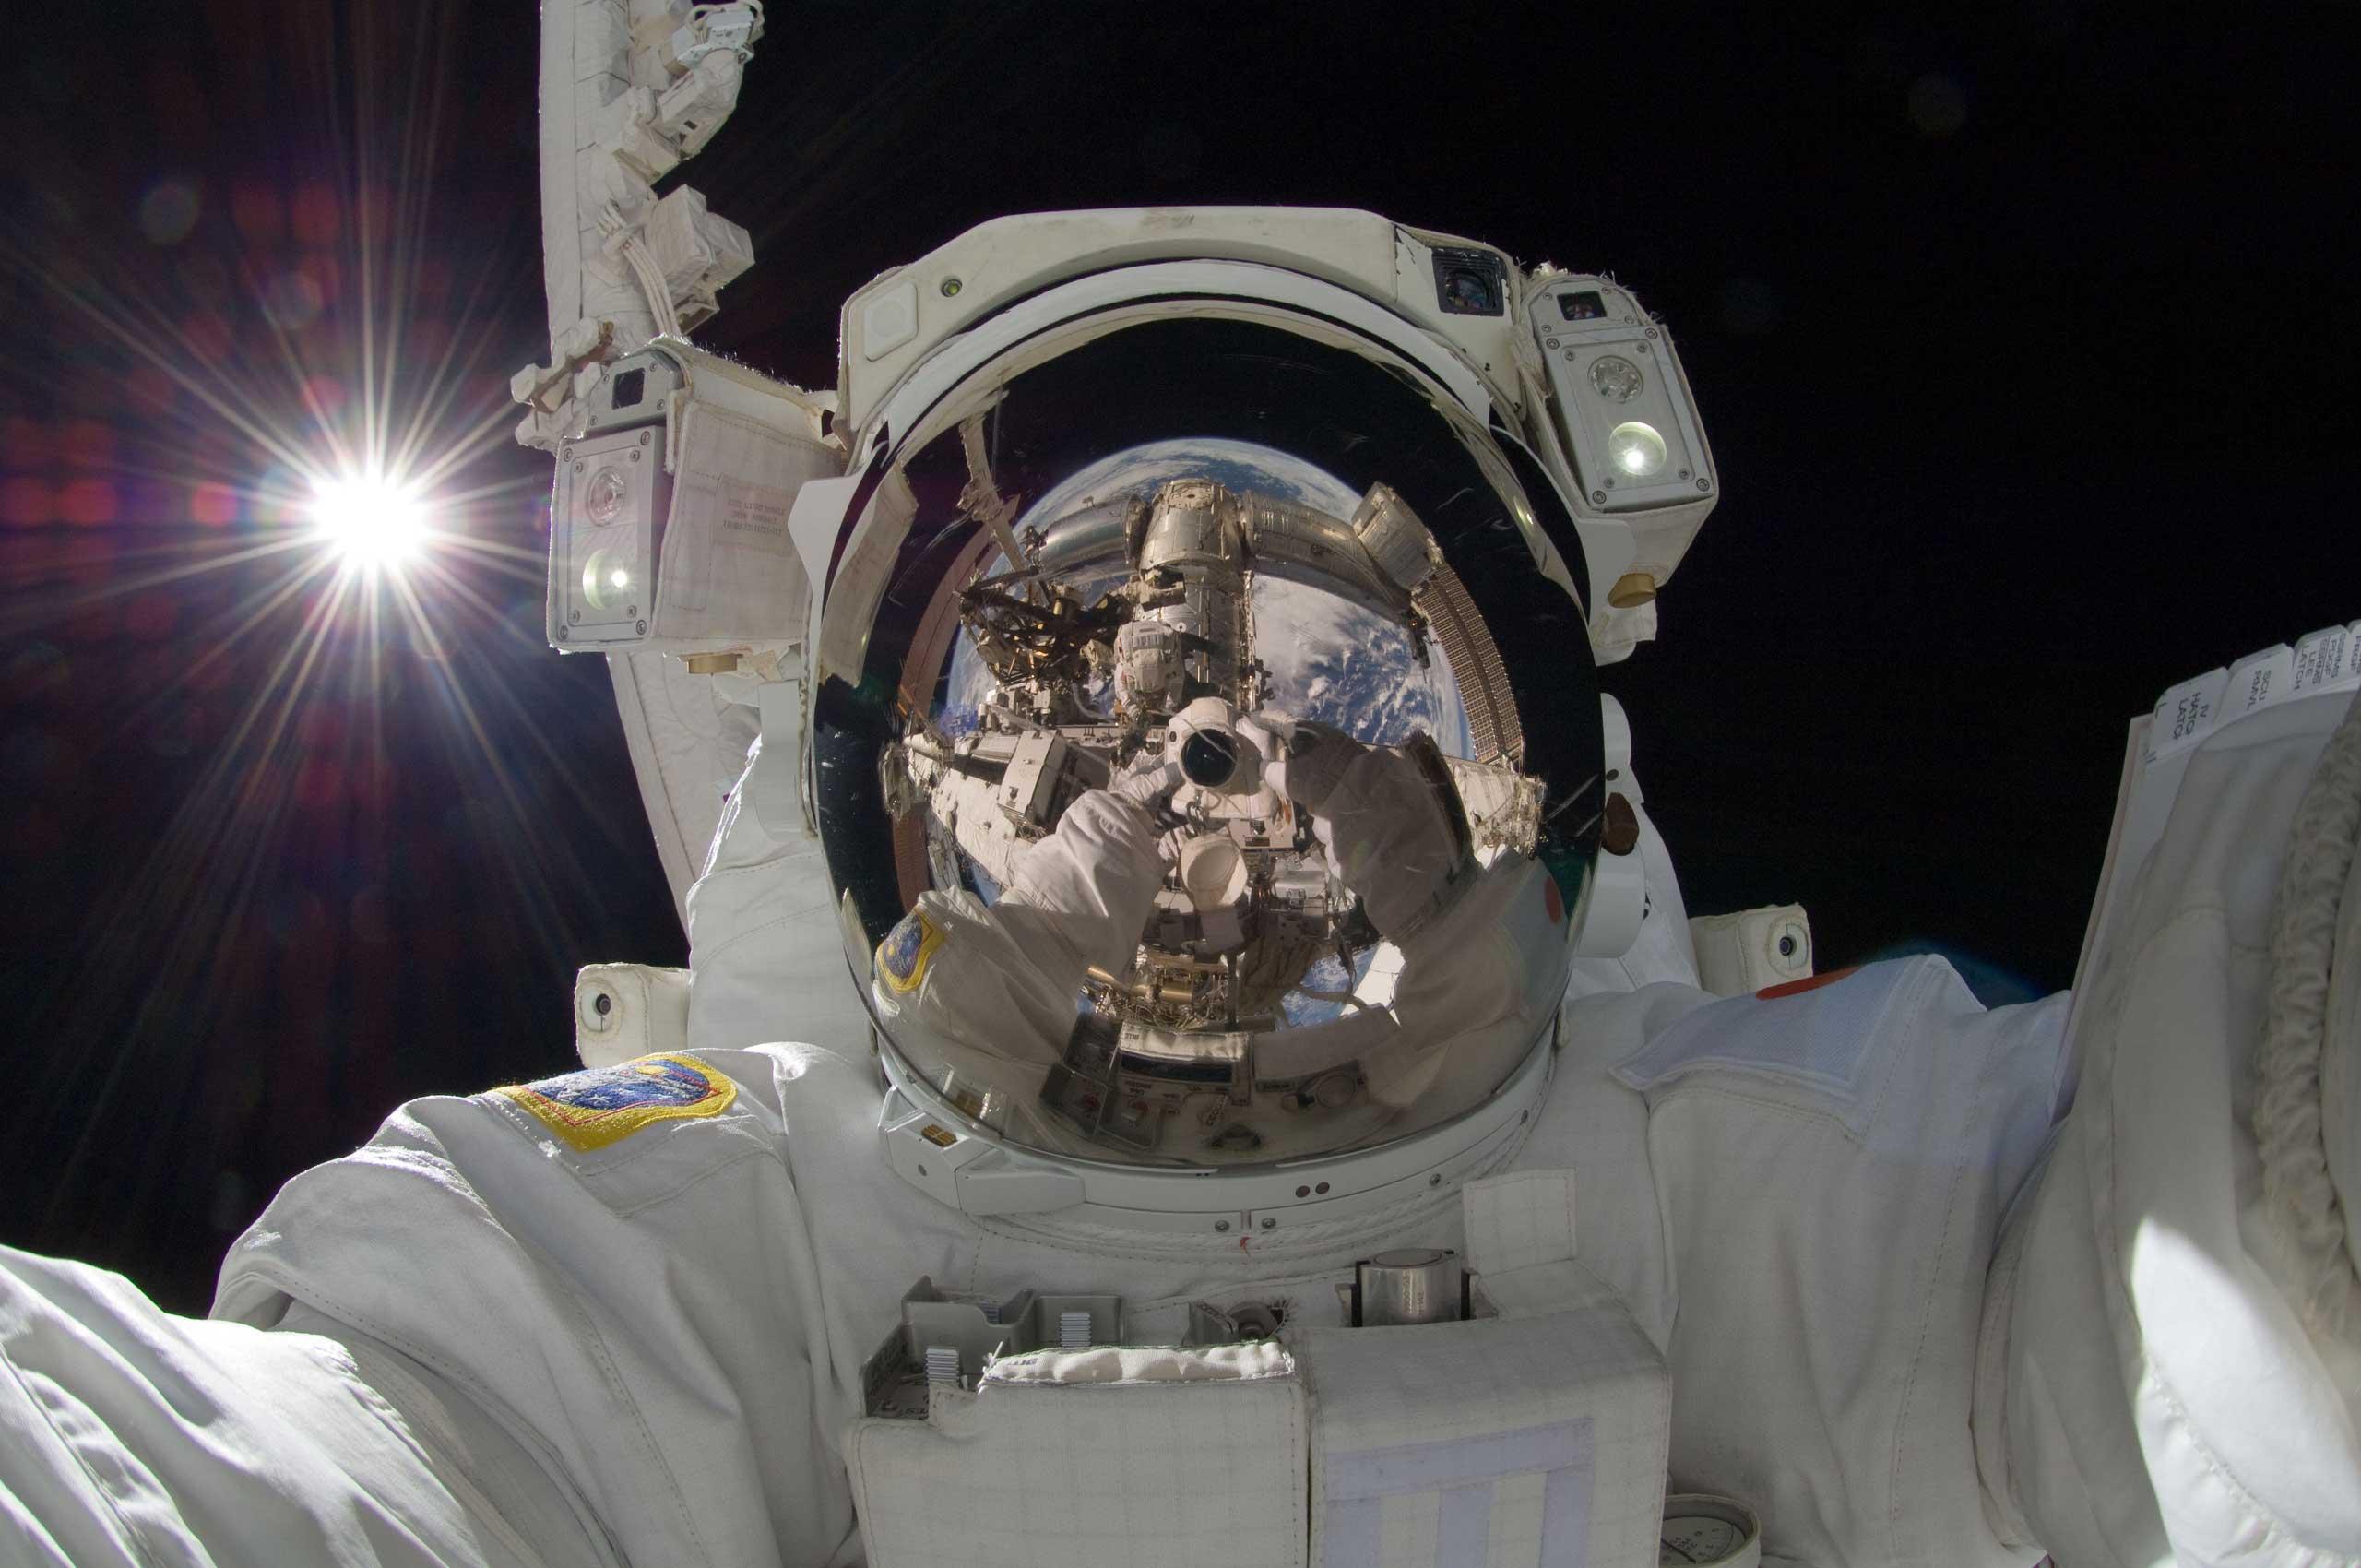 JAXA astronaut Aki Hoshide takes a selfie in Sept. 2012.